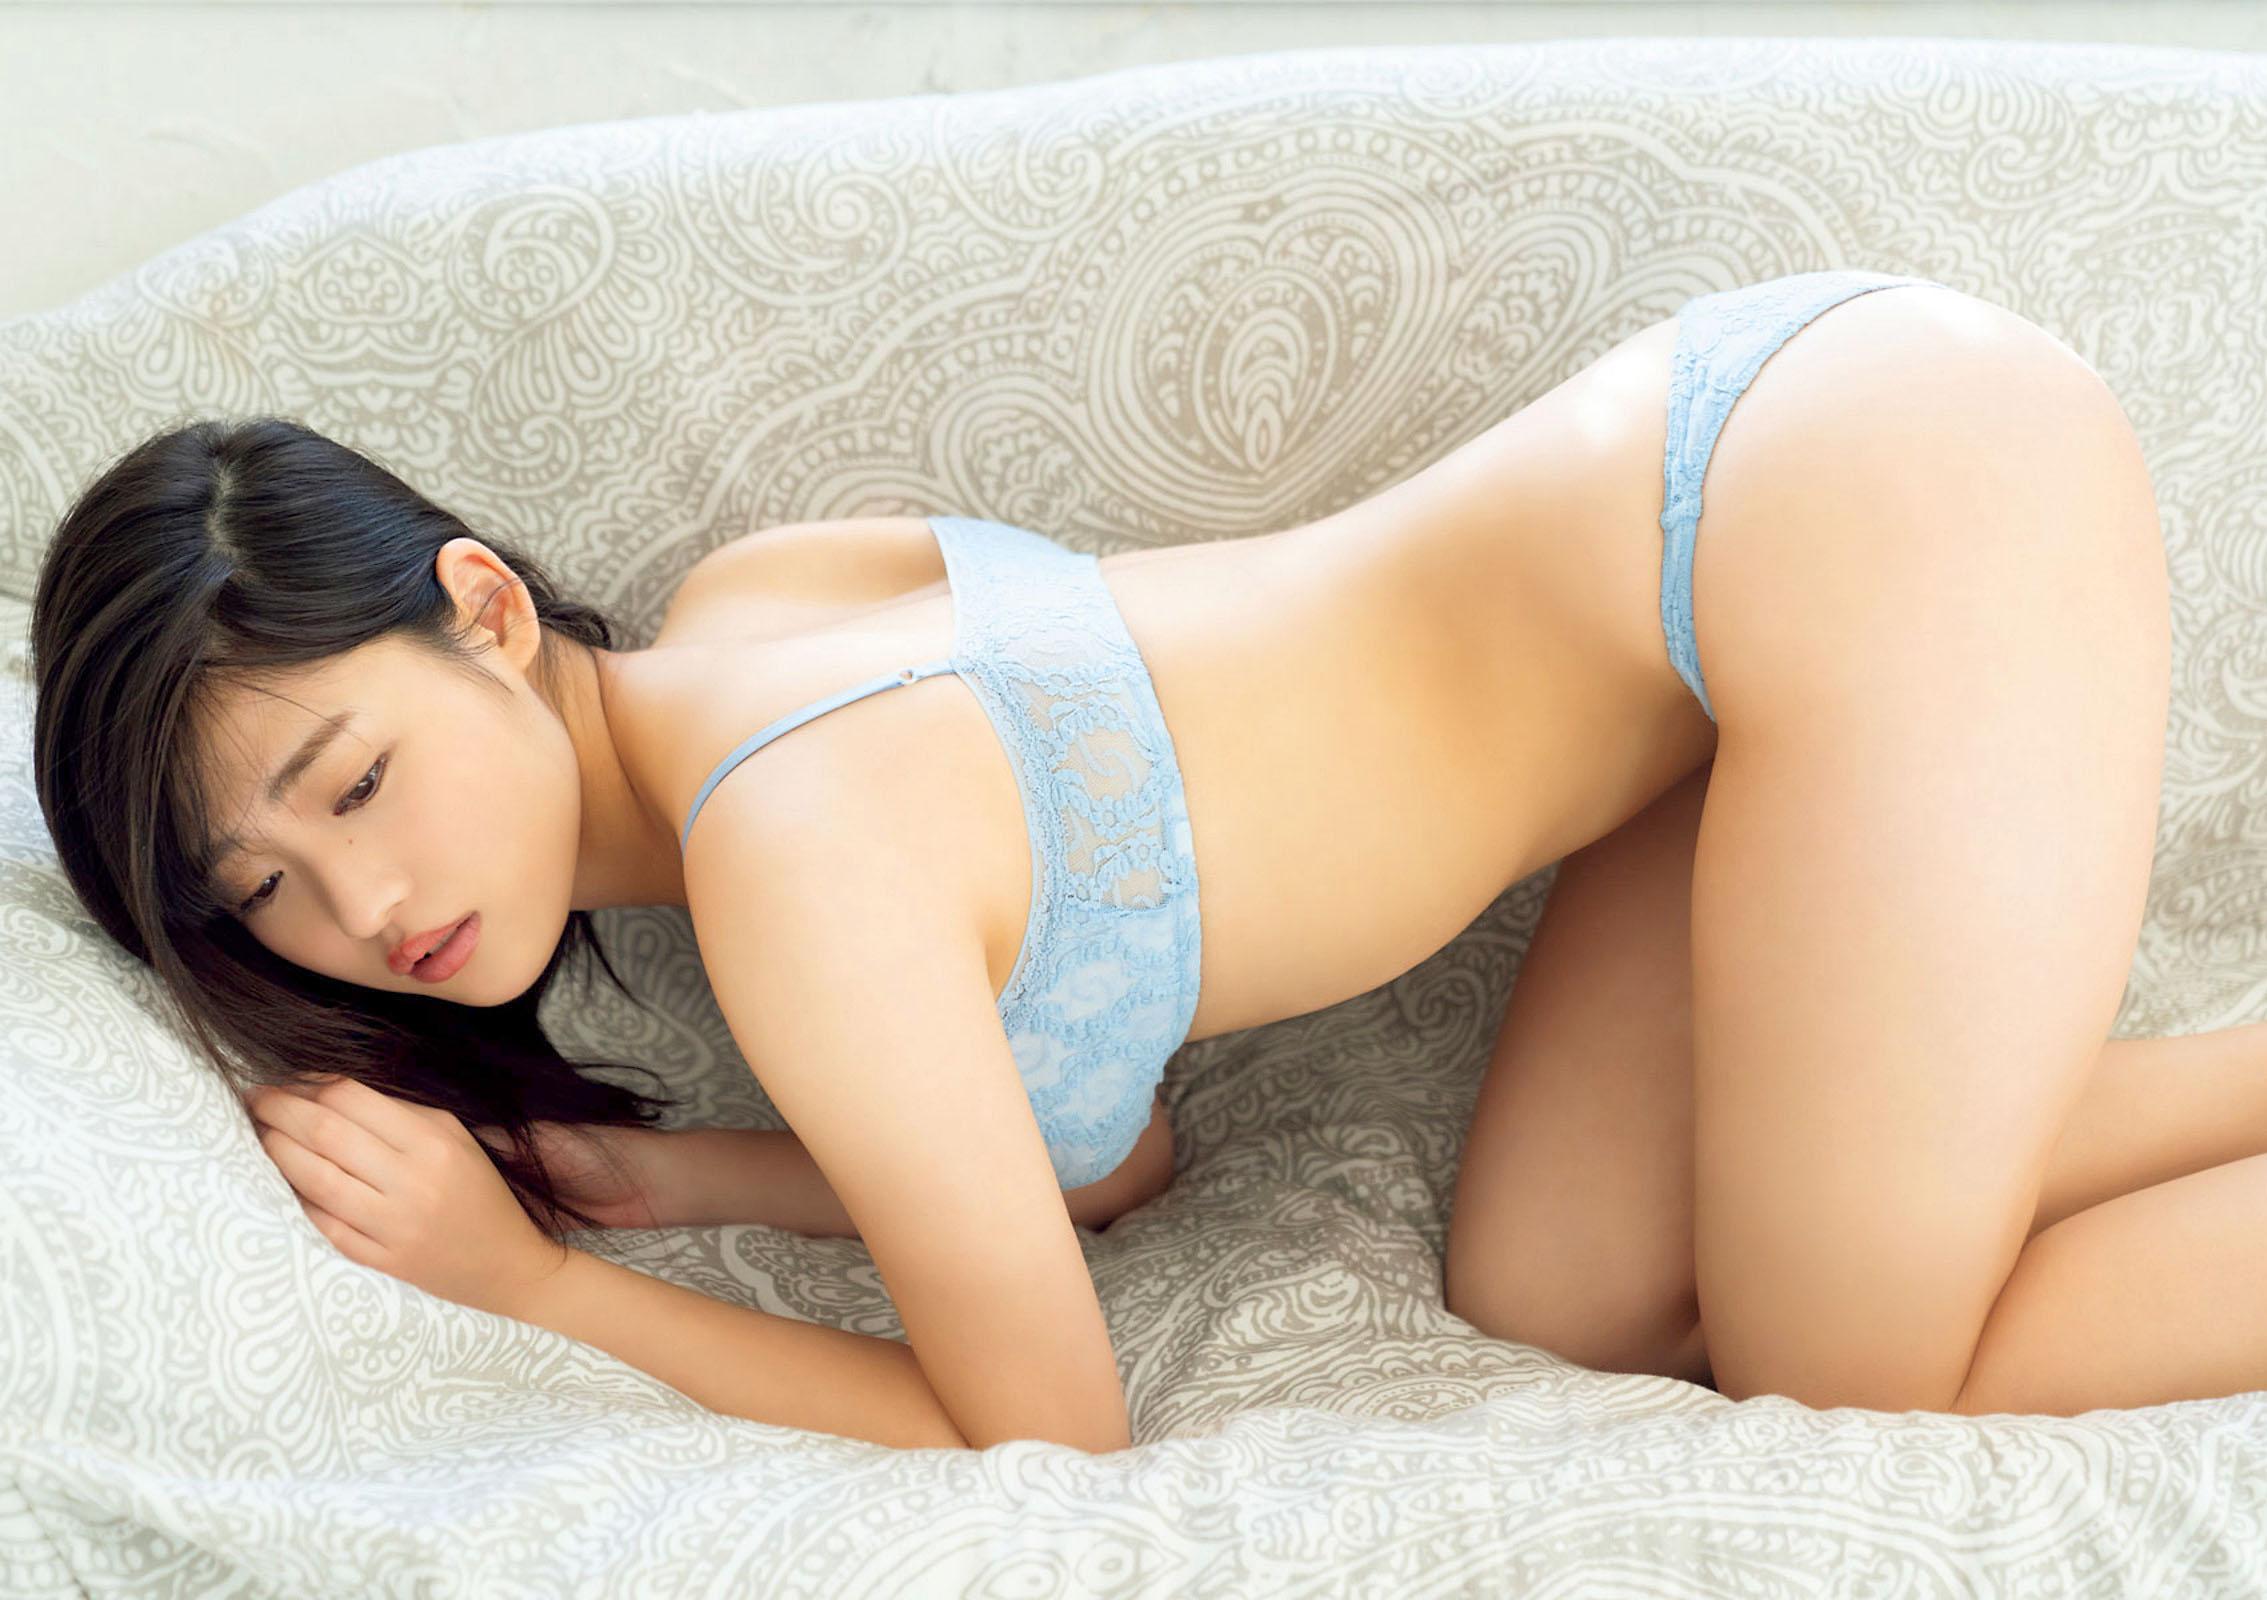 Momoka Ishida Big Comic Spirits 210208 12.jpg